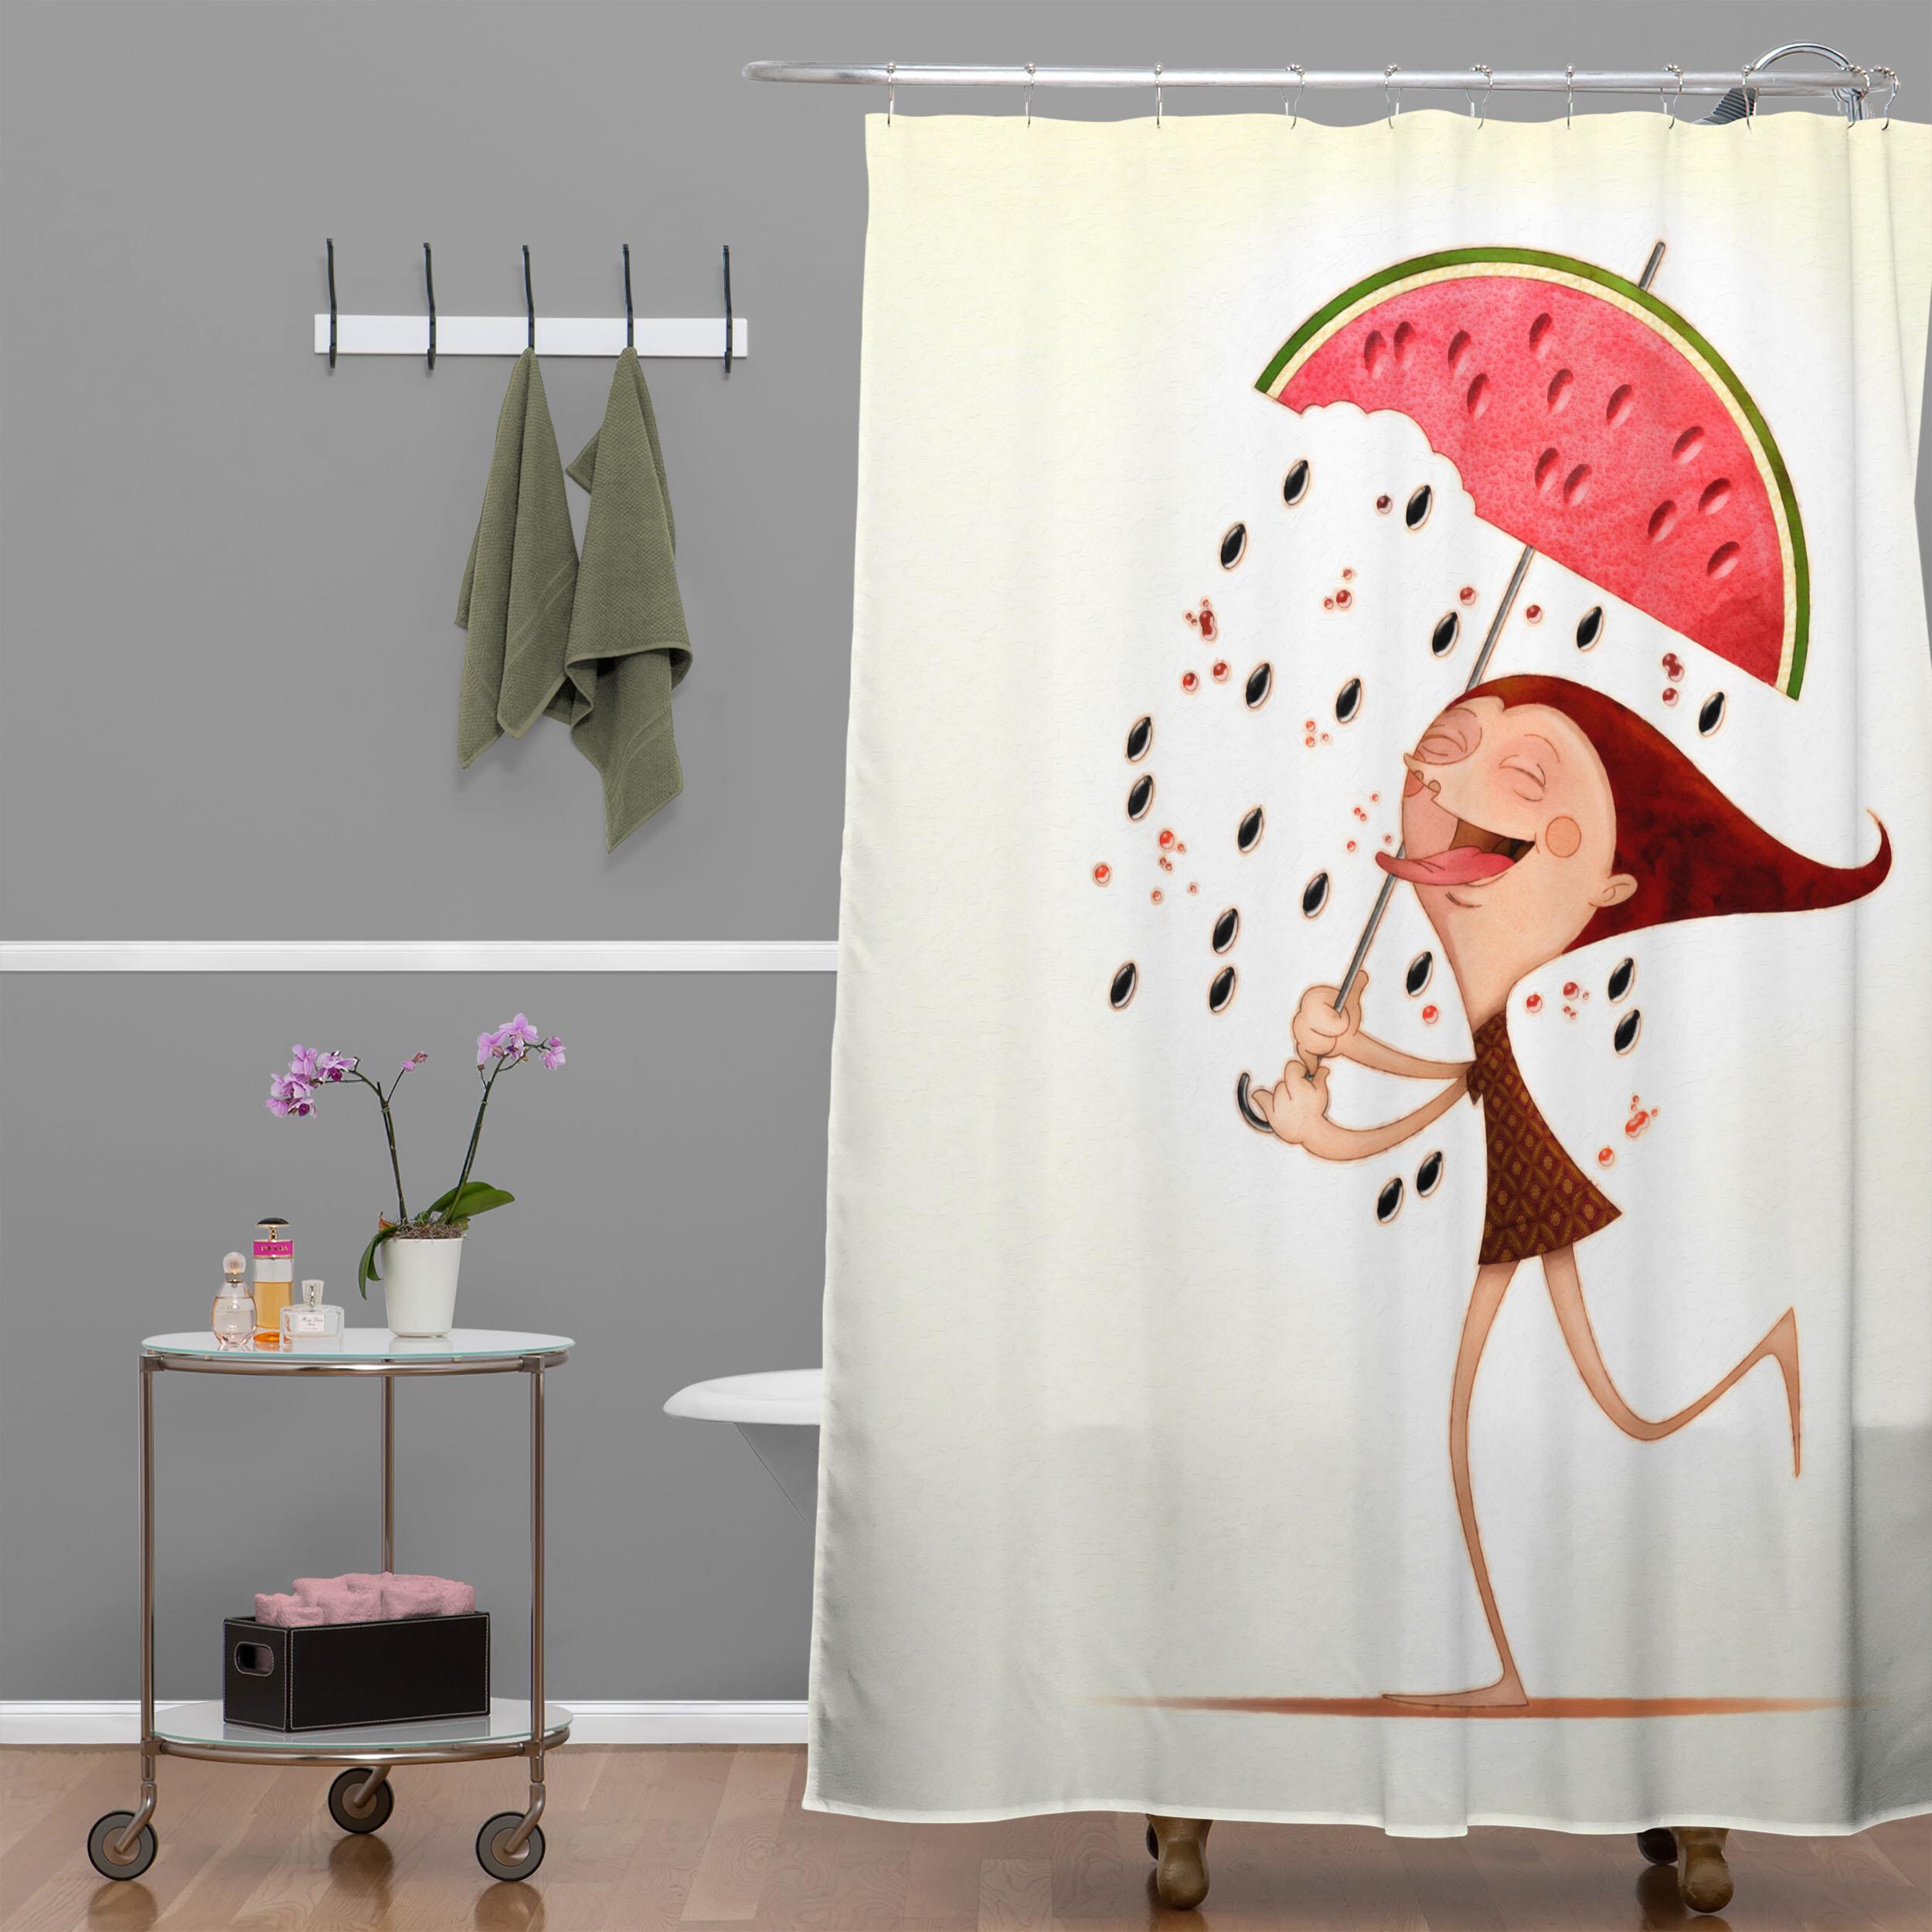 Deny Designs Jose Luis Guerrero Watermelon Single Shower Curtain Reviews Wayfair